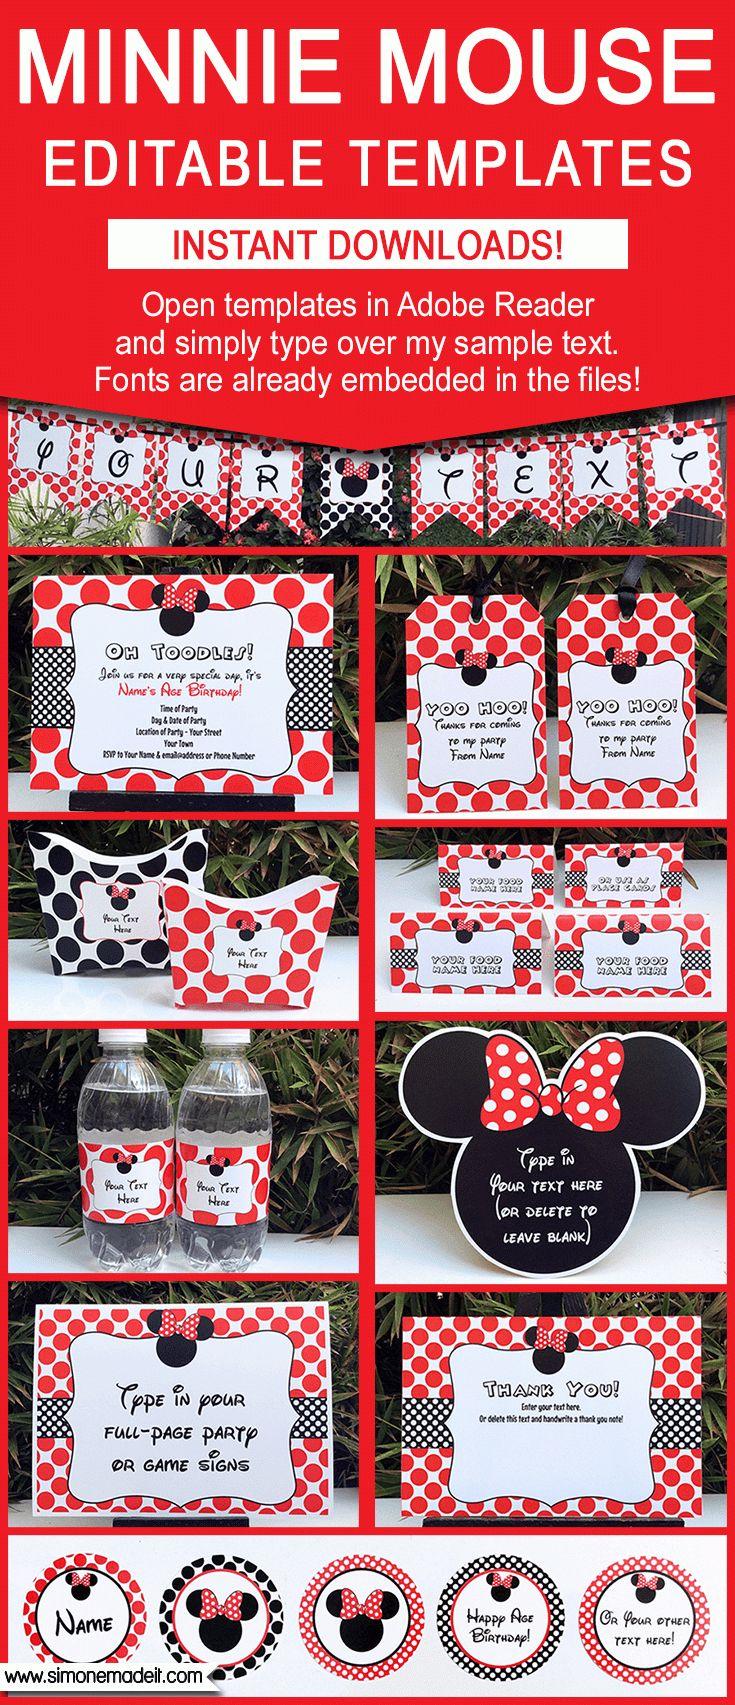 Black & Red Minnie Mouse Party Printables, Invitations & Decorations | Birthday Party | Editable Theme Templates | Via SIMONEmadeit.com | $12.50